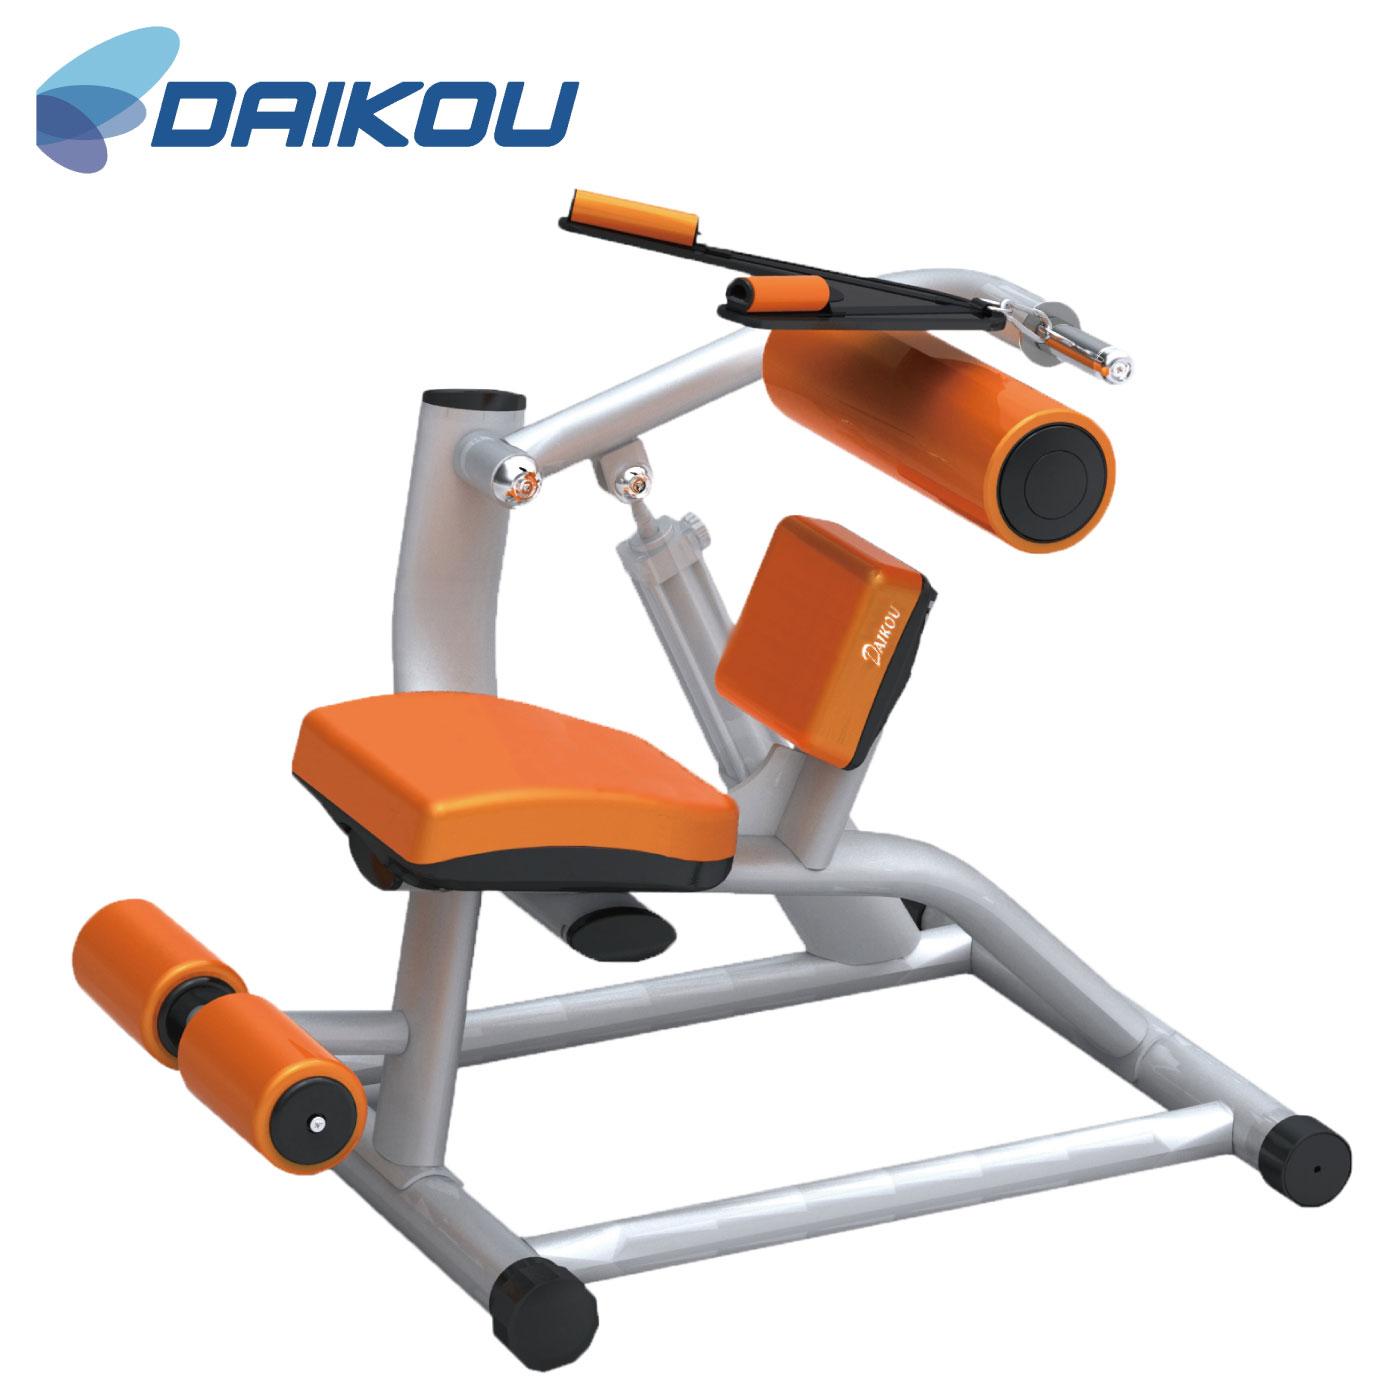 DK-1208(アブドミナルクランチ・バックエクステンション)/準業務用油圧マシン《DAIKOU(ダイコー)》